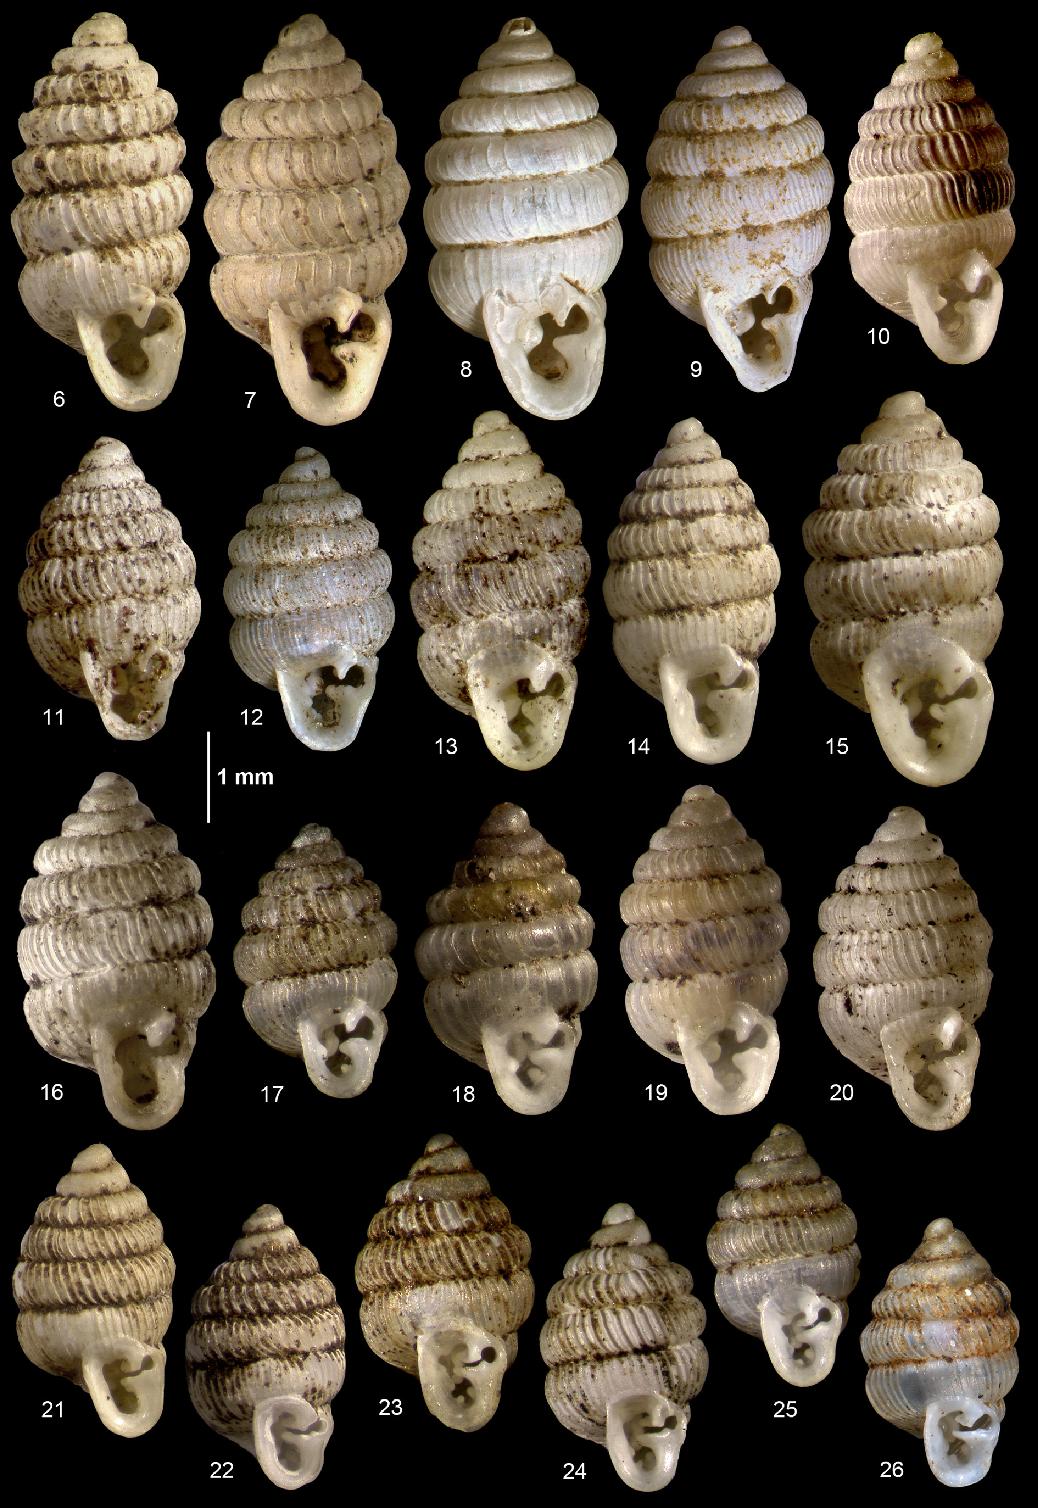 figure 6-26